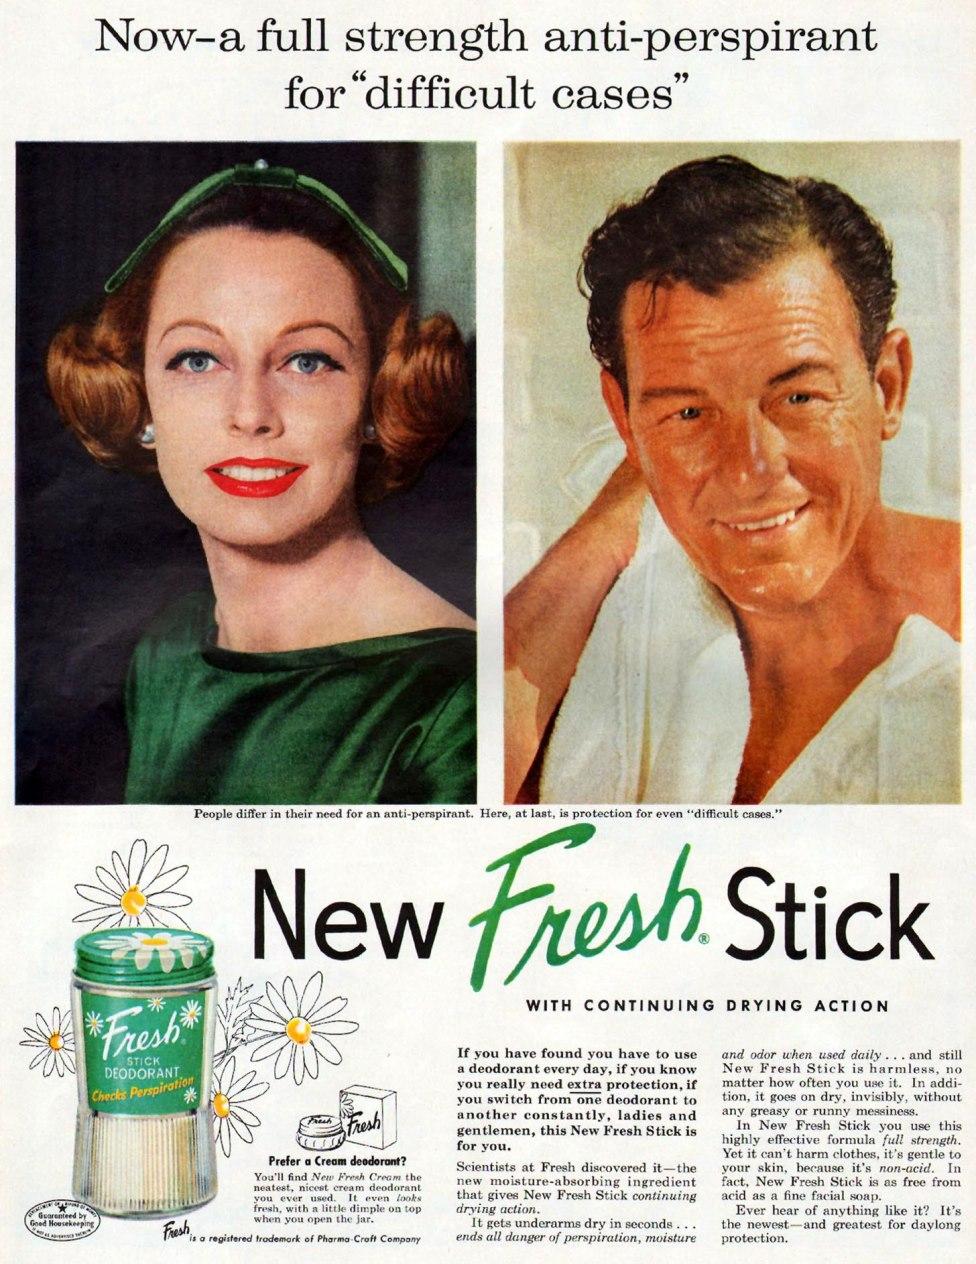 FRESH STICK DEODORANT LIFE 04/01/1957 p. 22